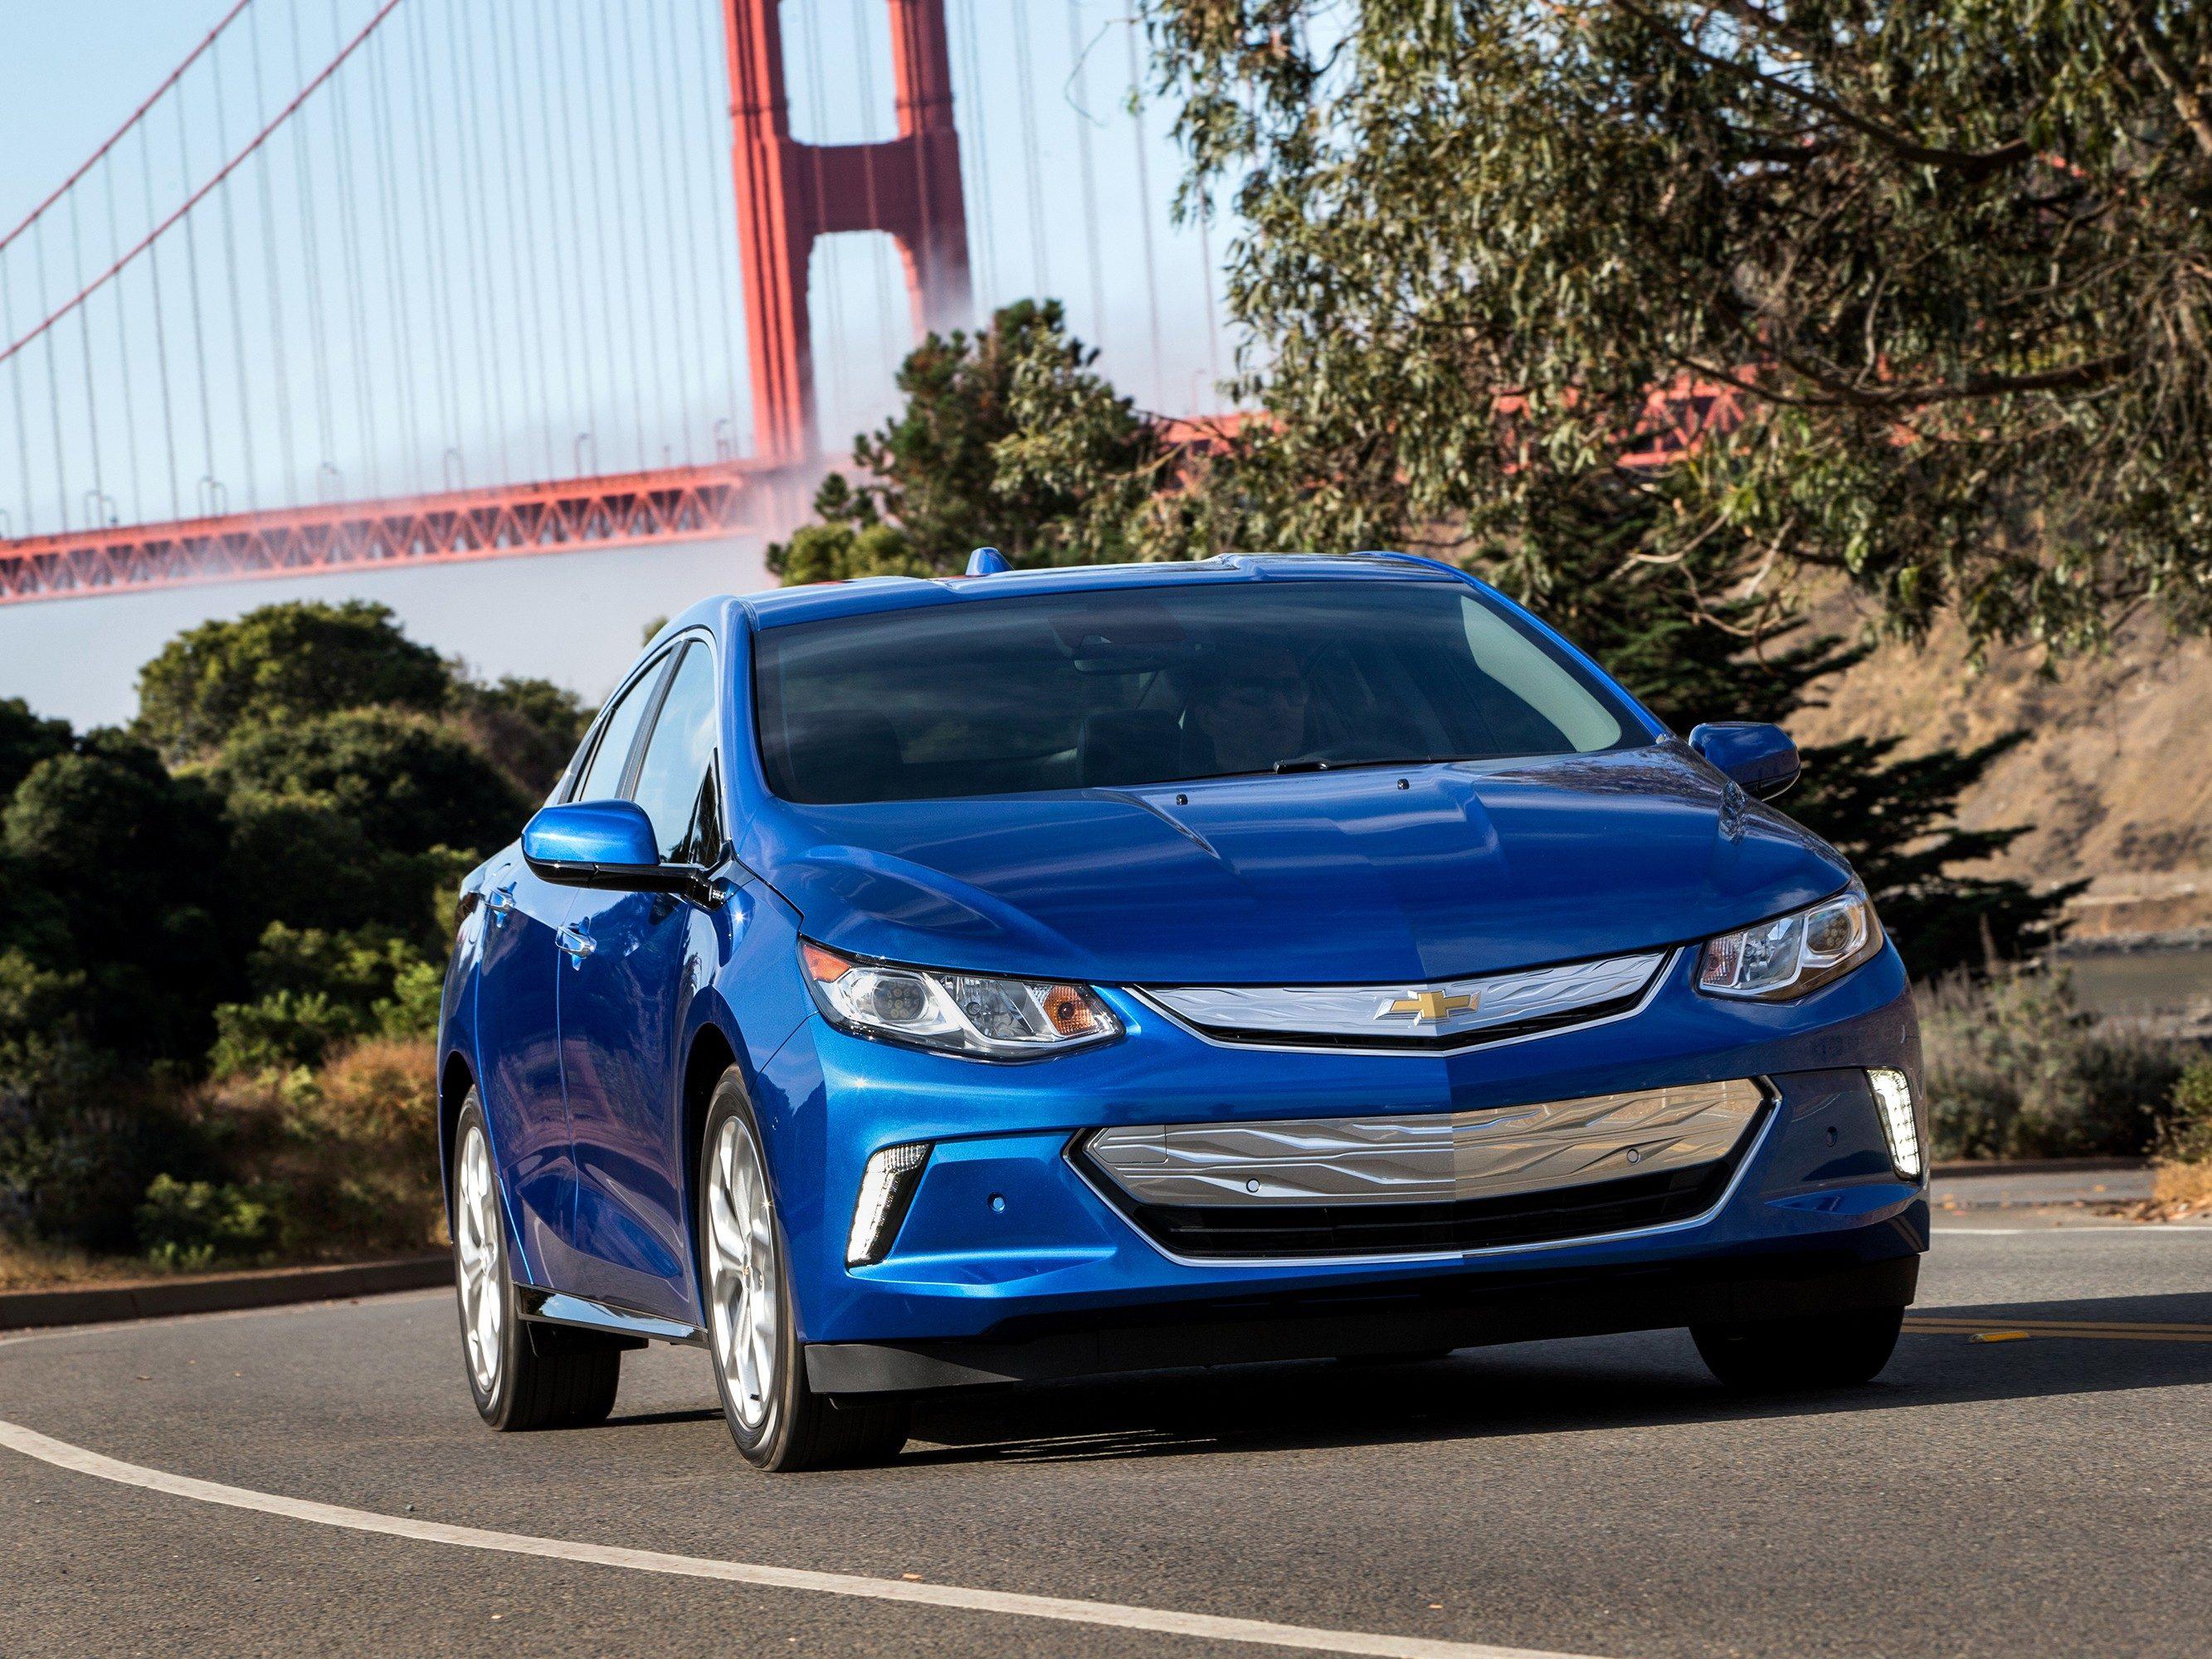 3. The 2016 Chevrolet Volt Has a Better Range